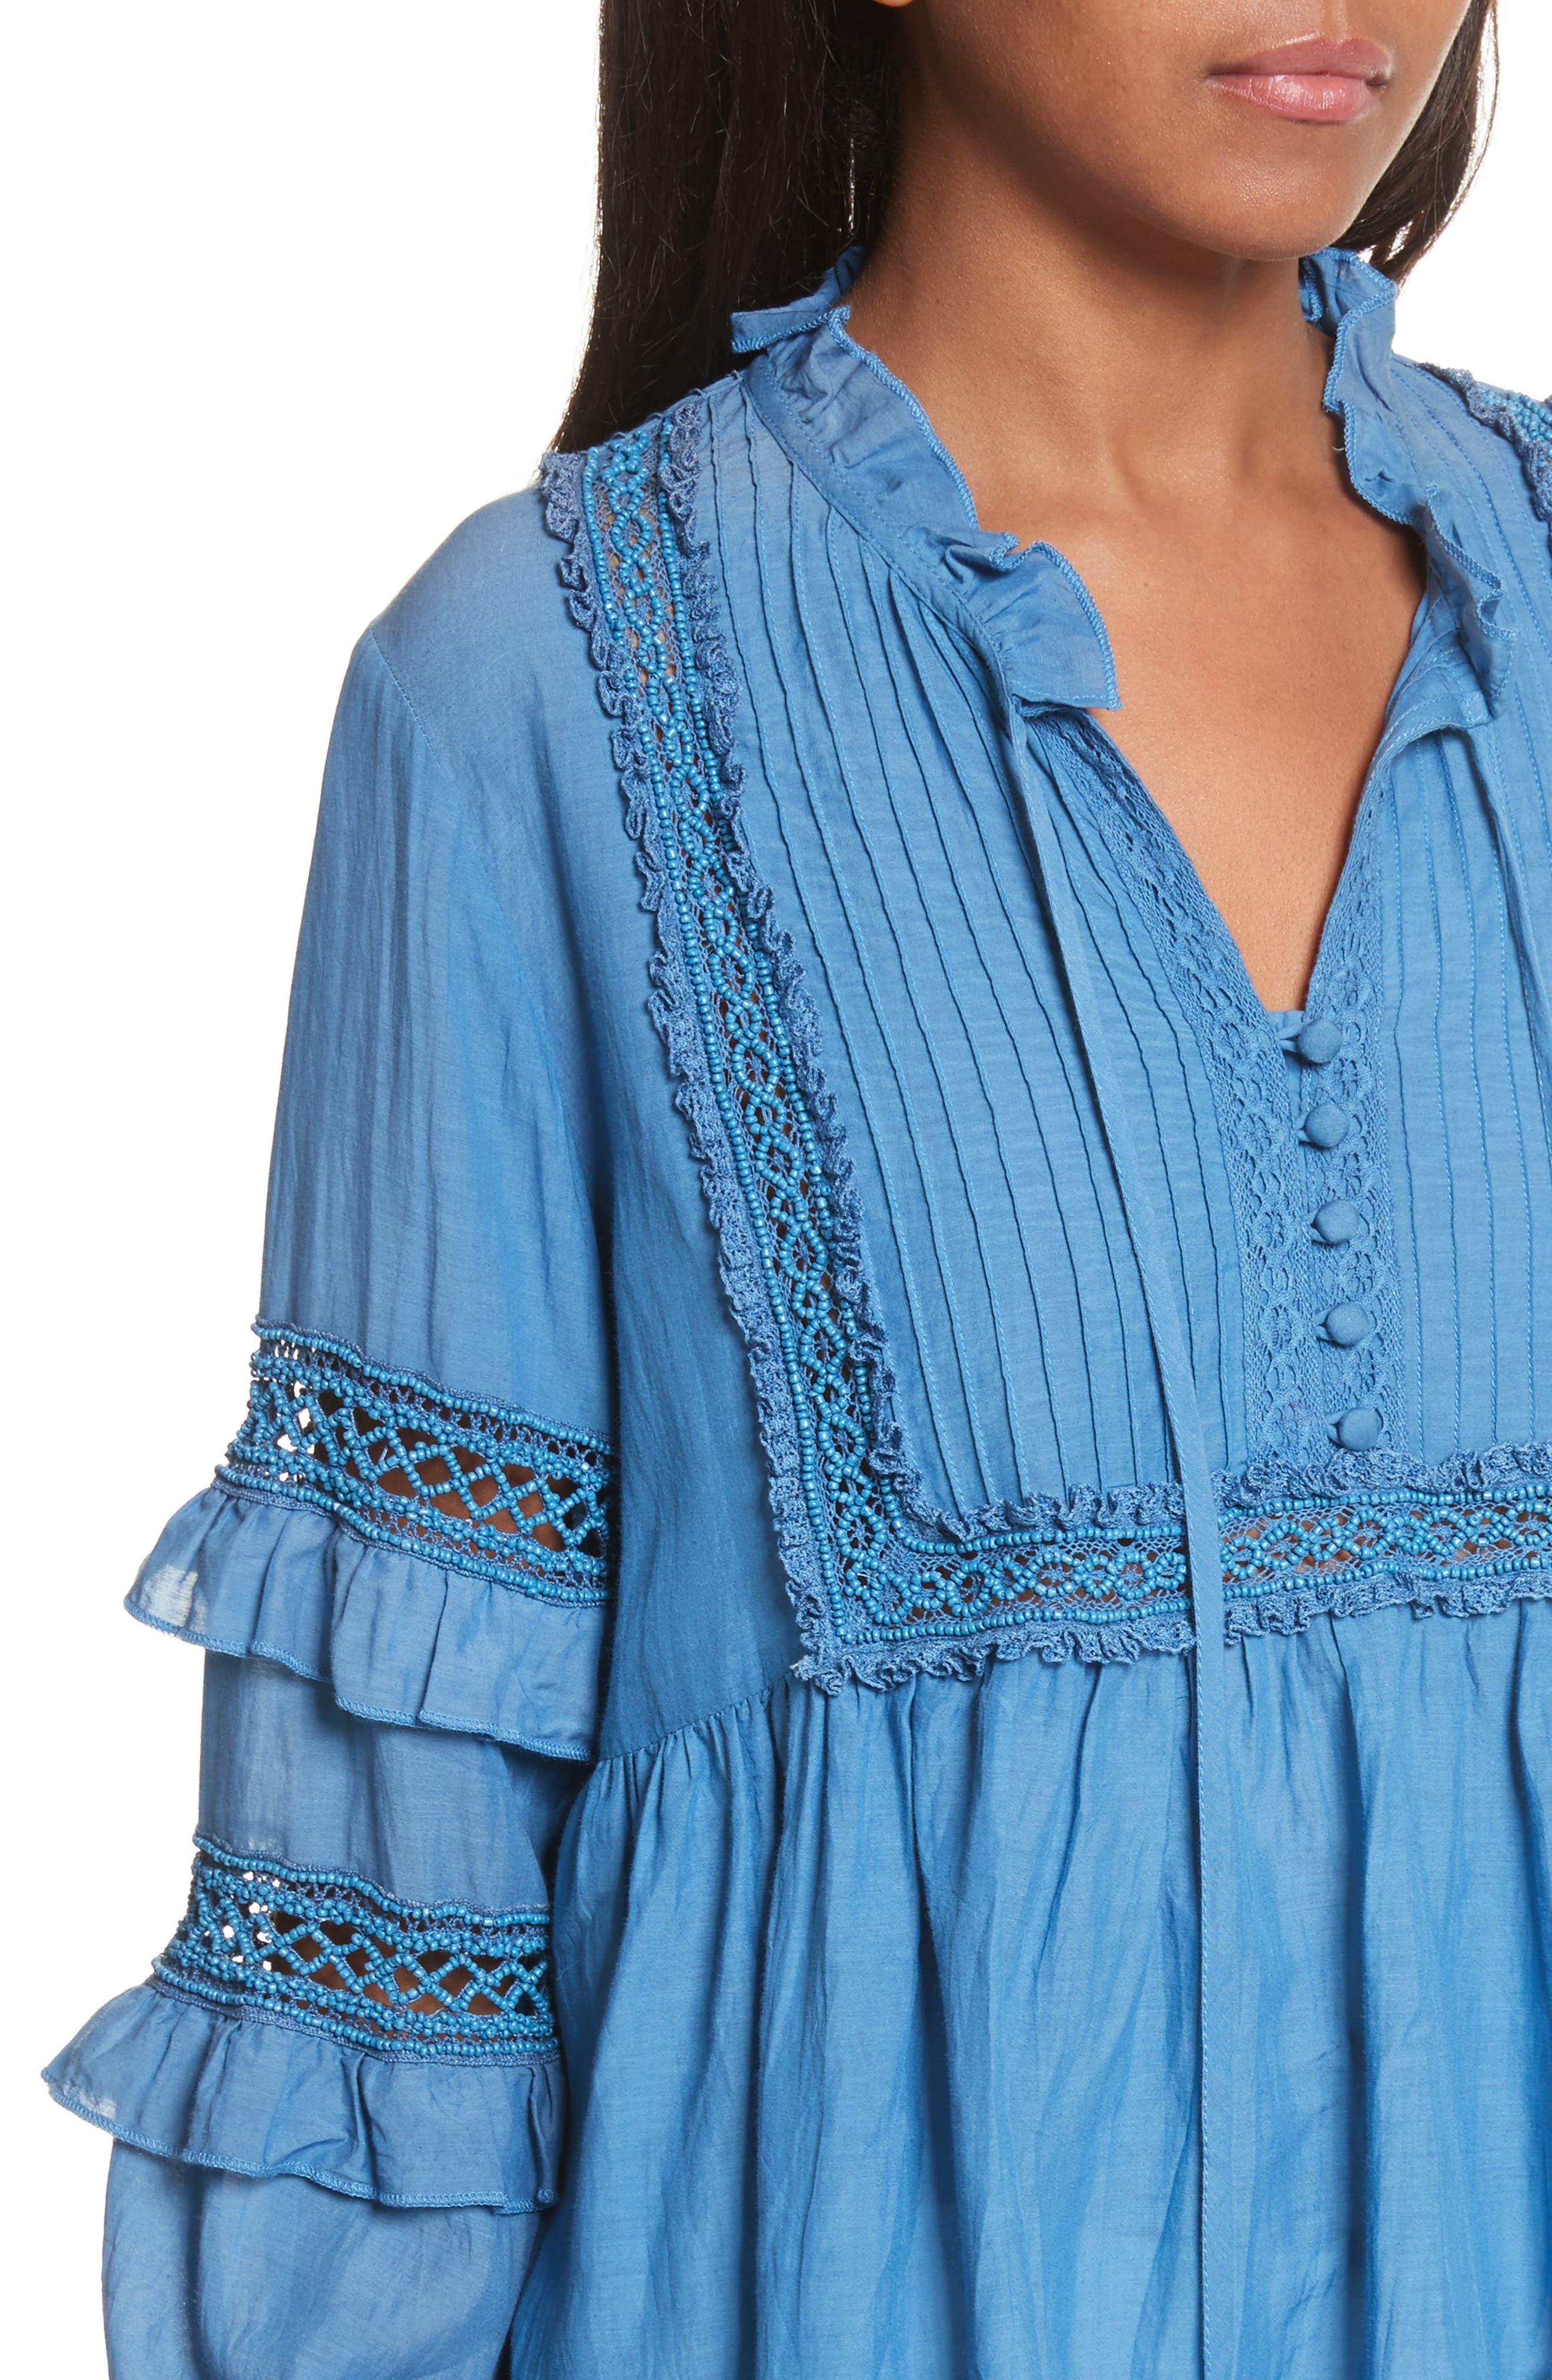 Adaline Ruffle Cotton Blouse,                             Alternate thumbnail 4, color,                             400